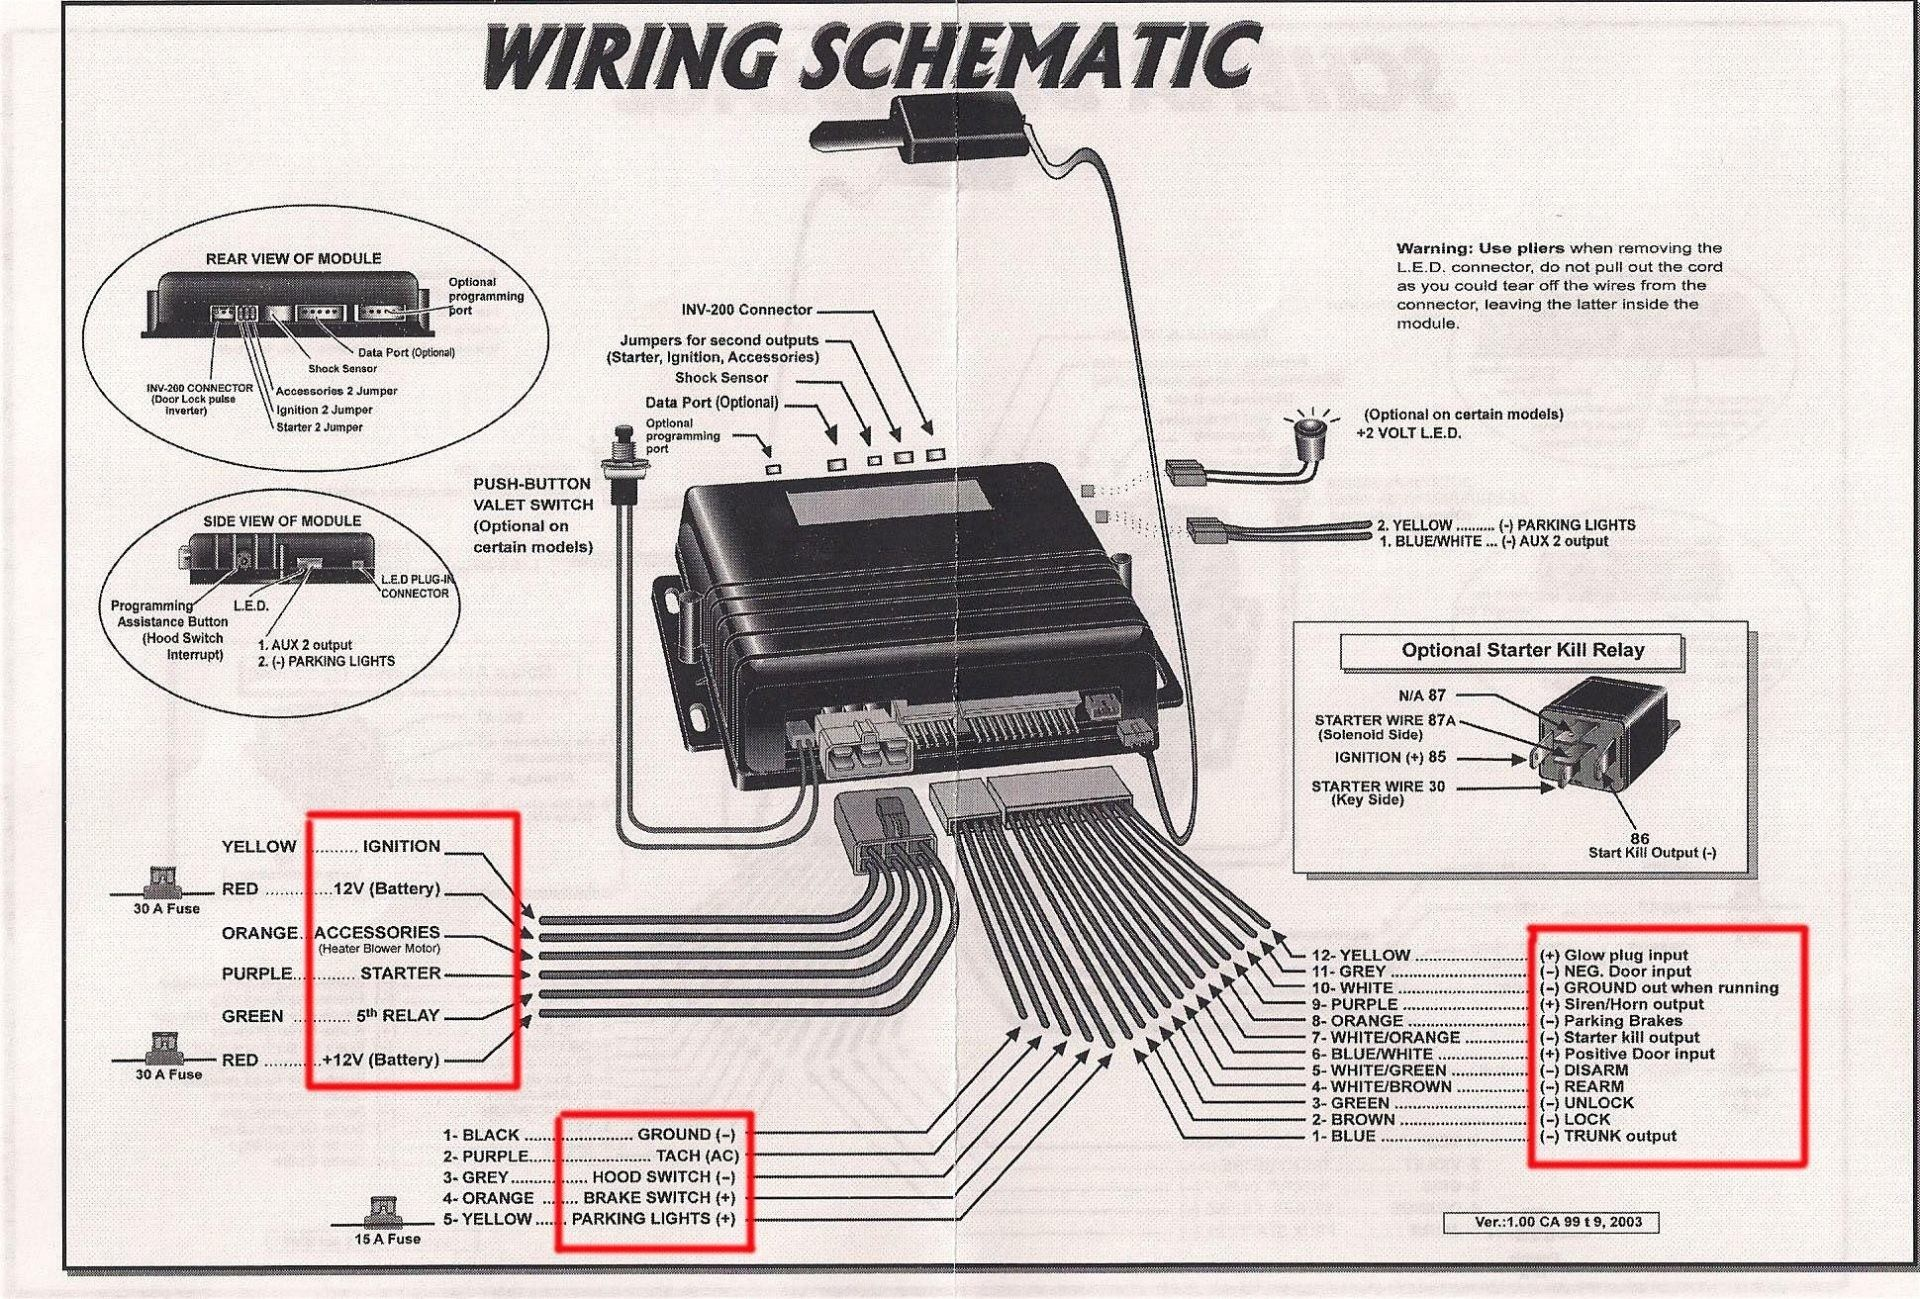 viper alarm system wiring diagram million wiring diagram